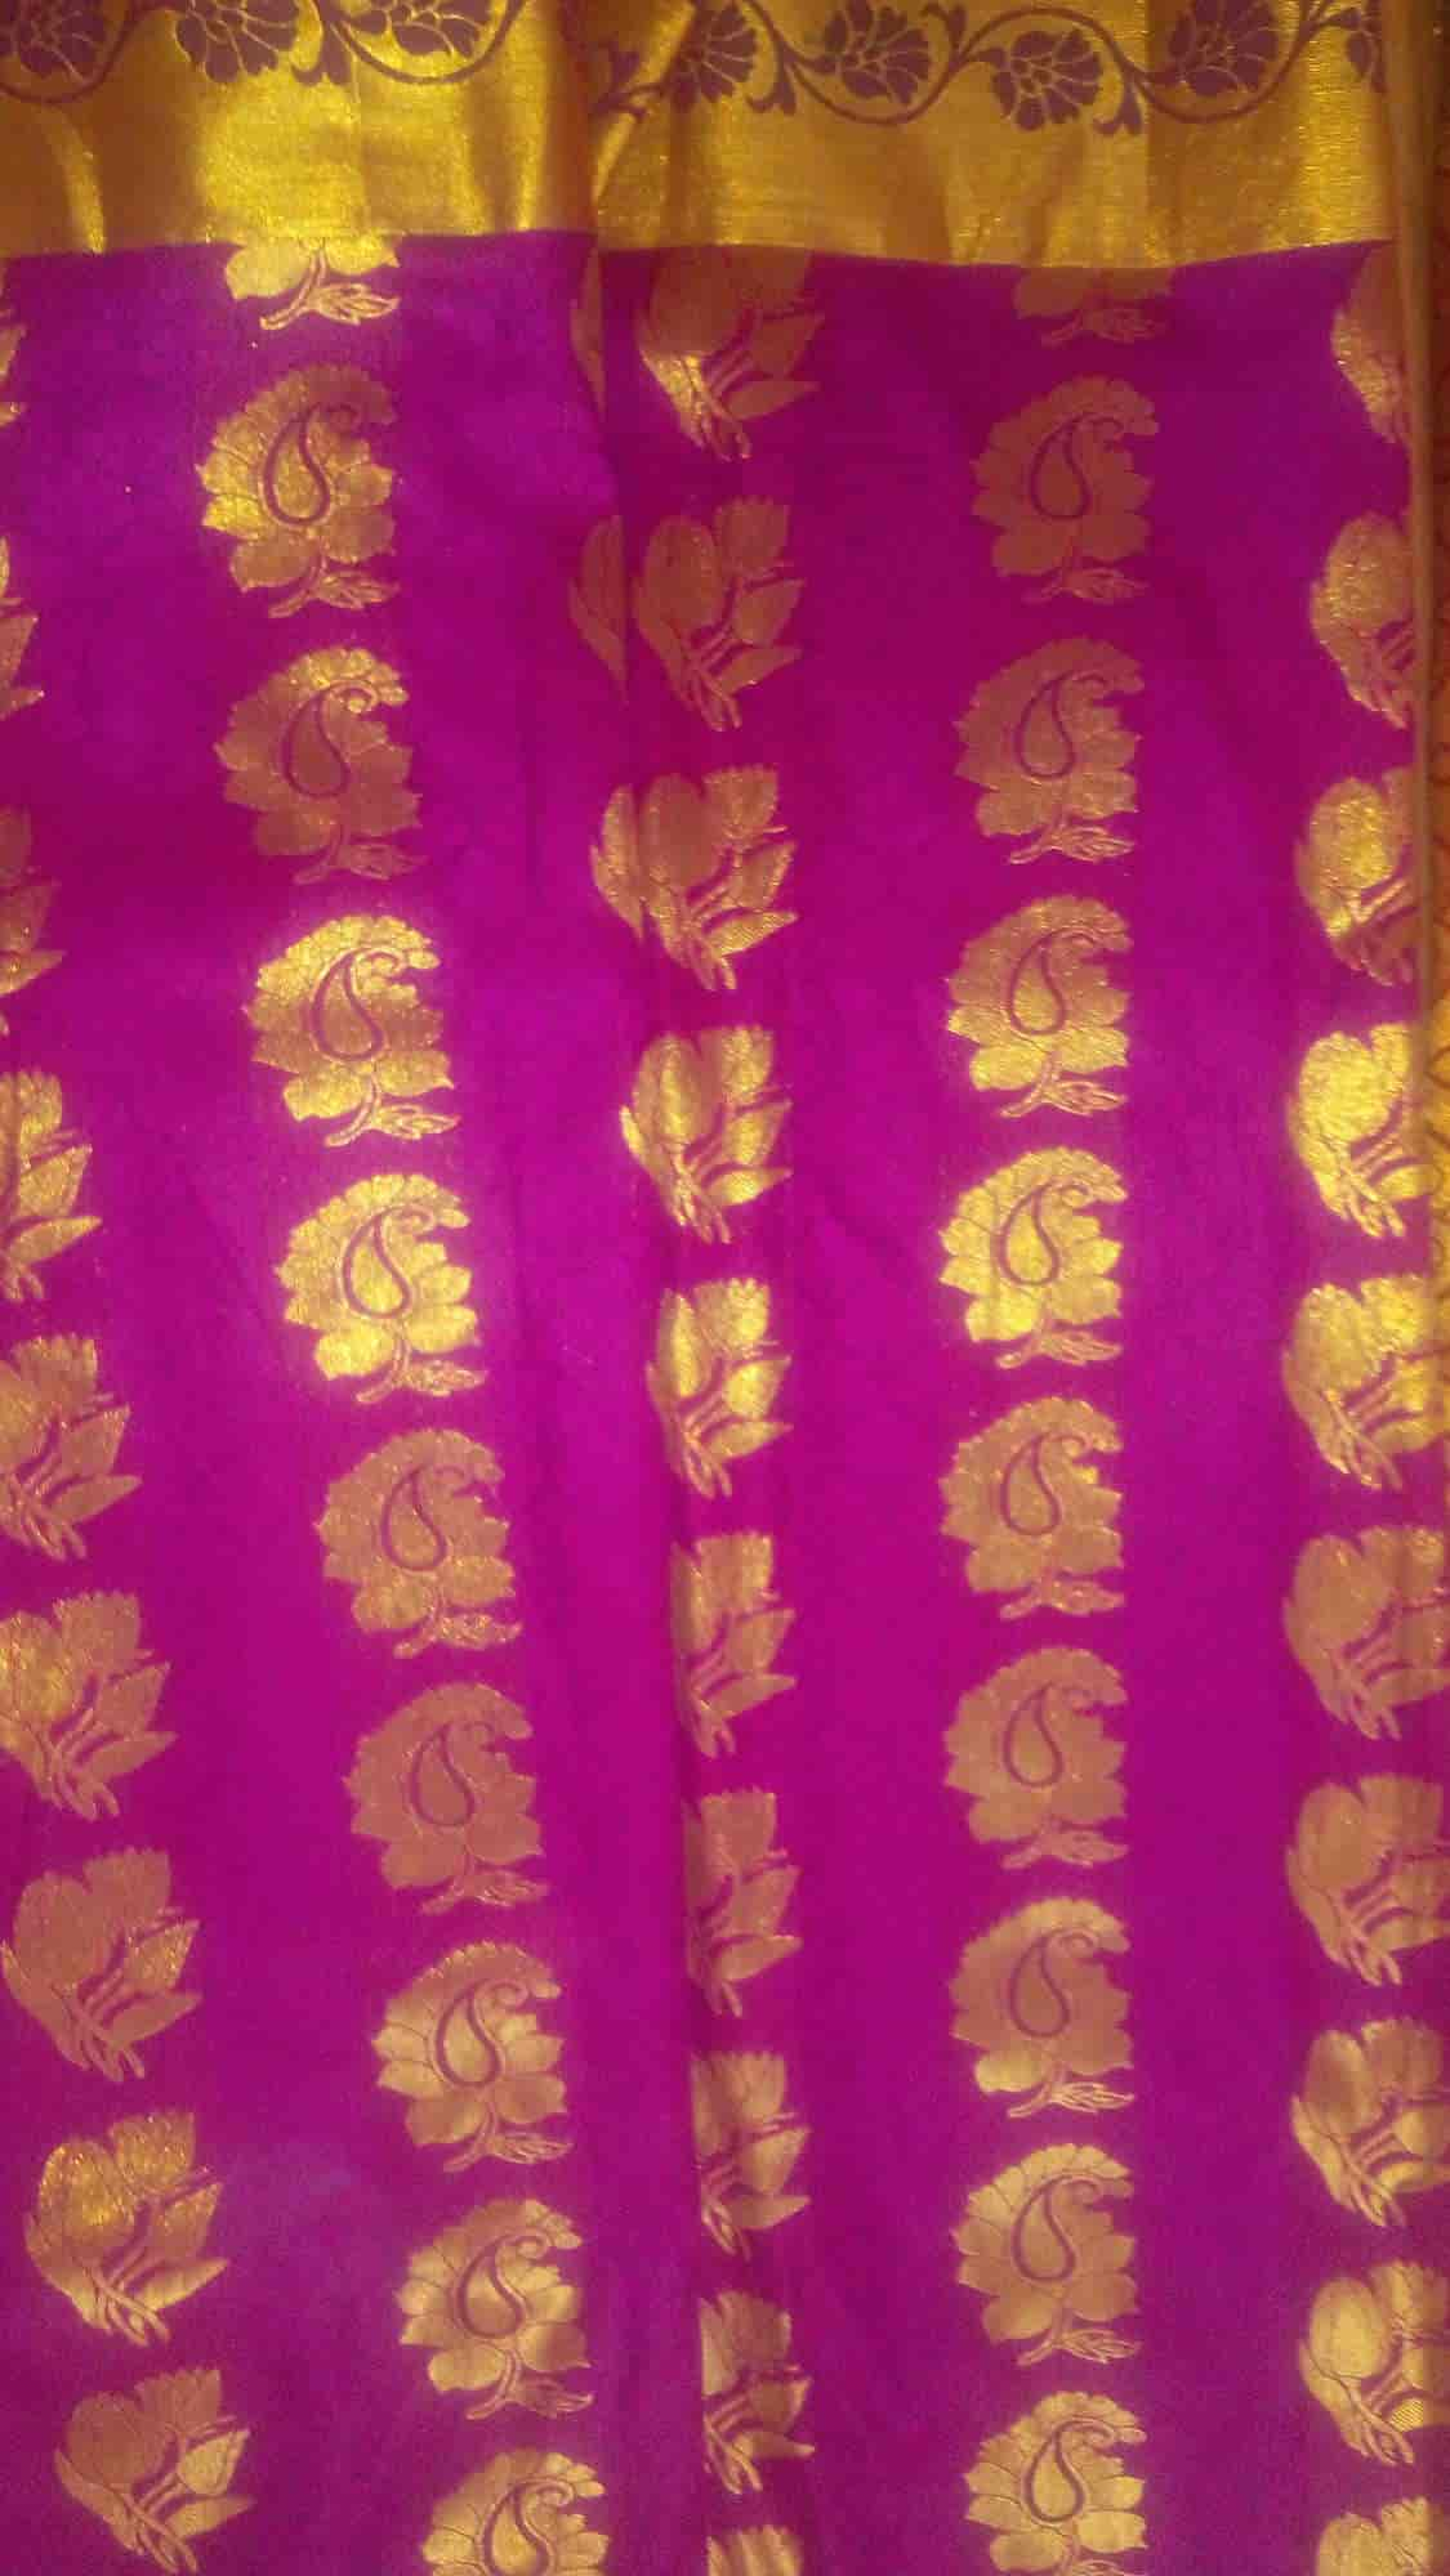 Annamalai Old Cloth Buyer, Kannappar Thidal - Second Hand